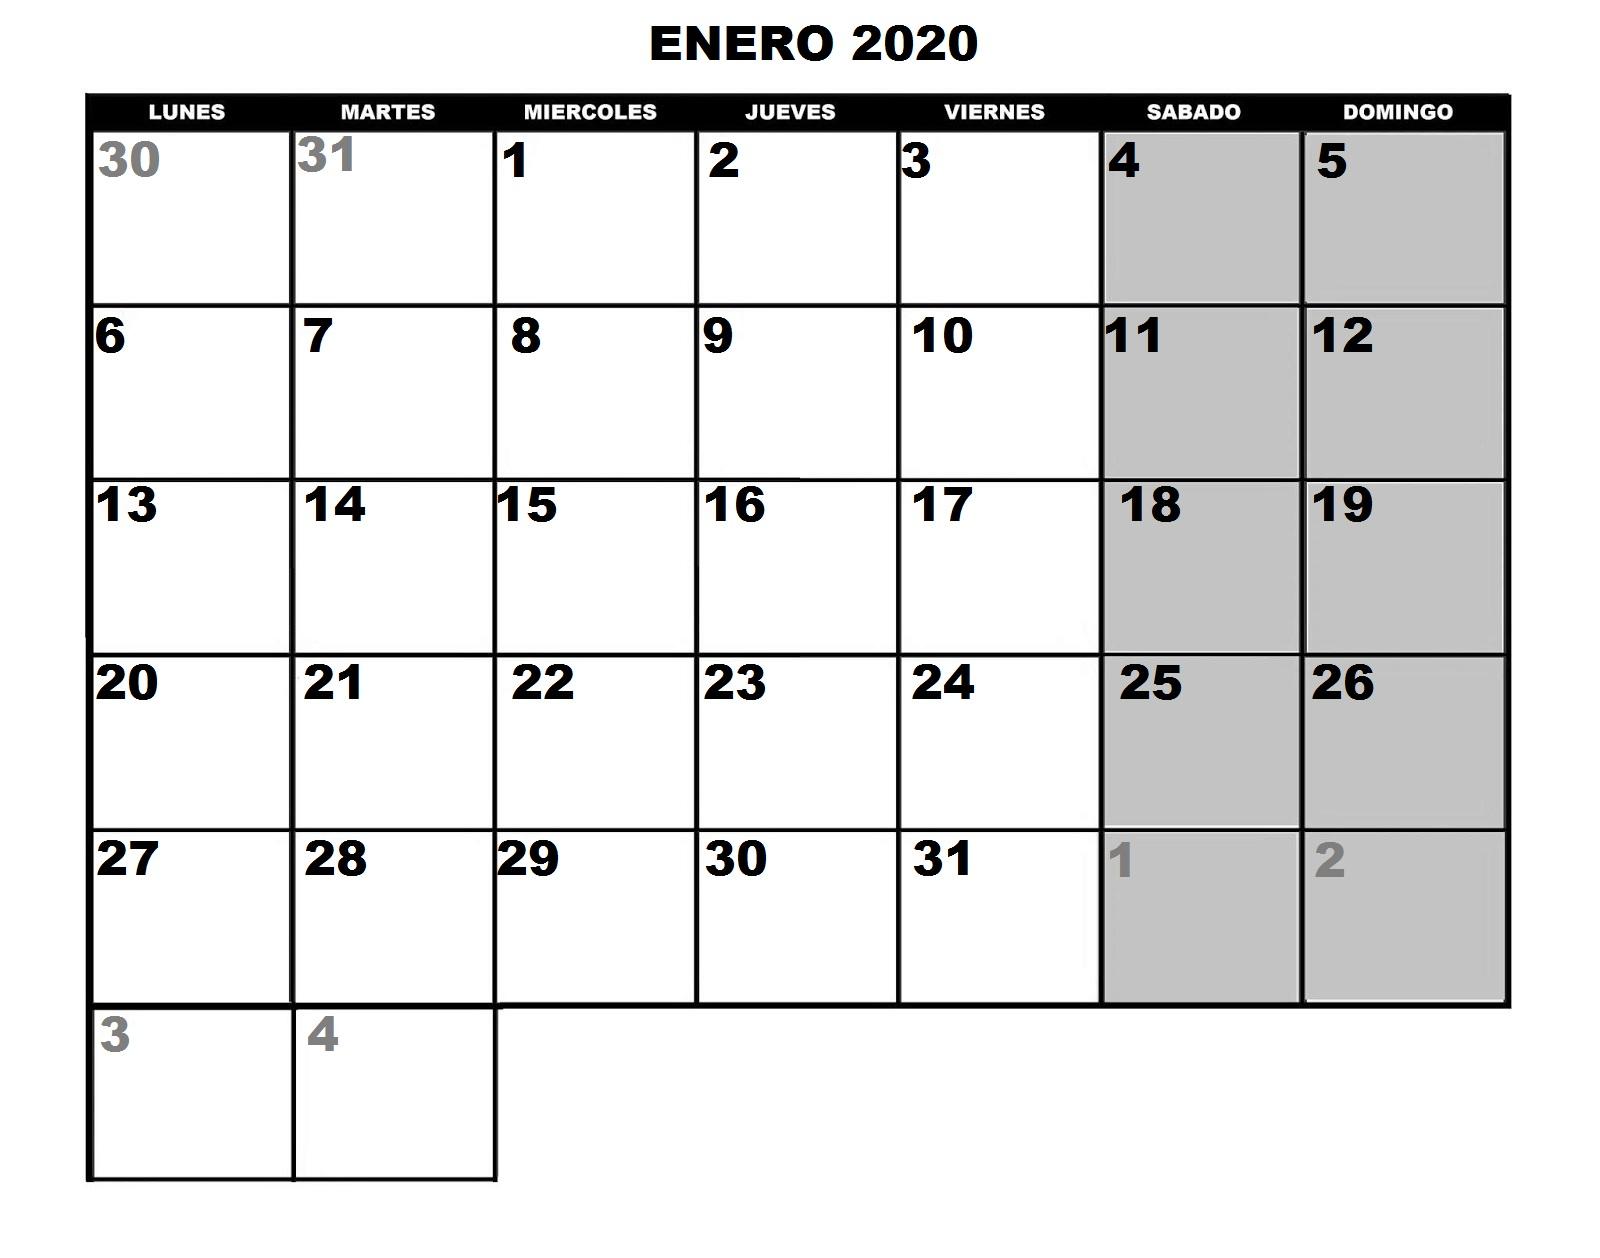 Calendario Mes De Octubre 2020 Para Imprimir.Tornadojack Calendario 2020 Para Imprimir Y Poner Fotos A